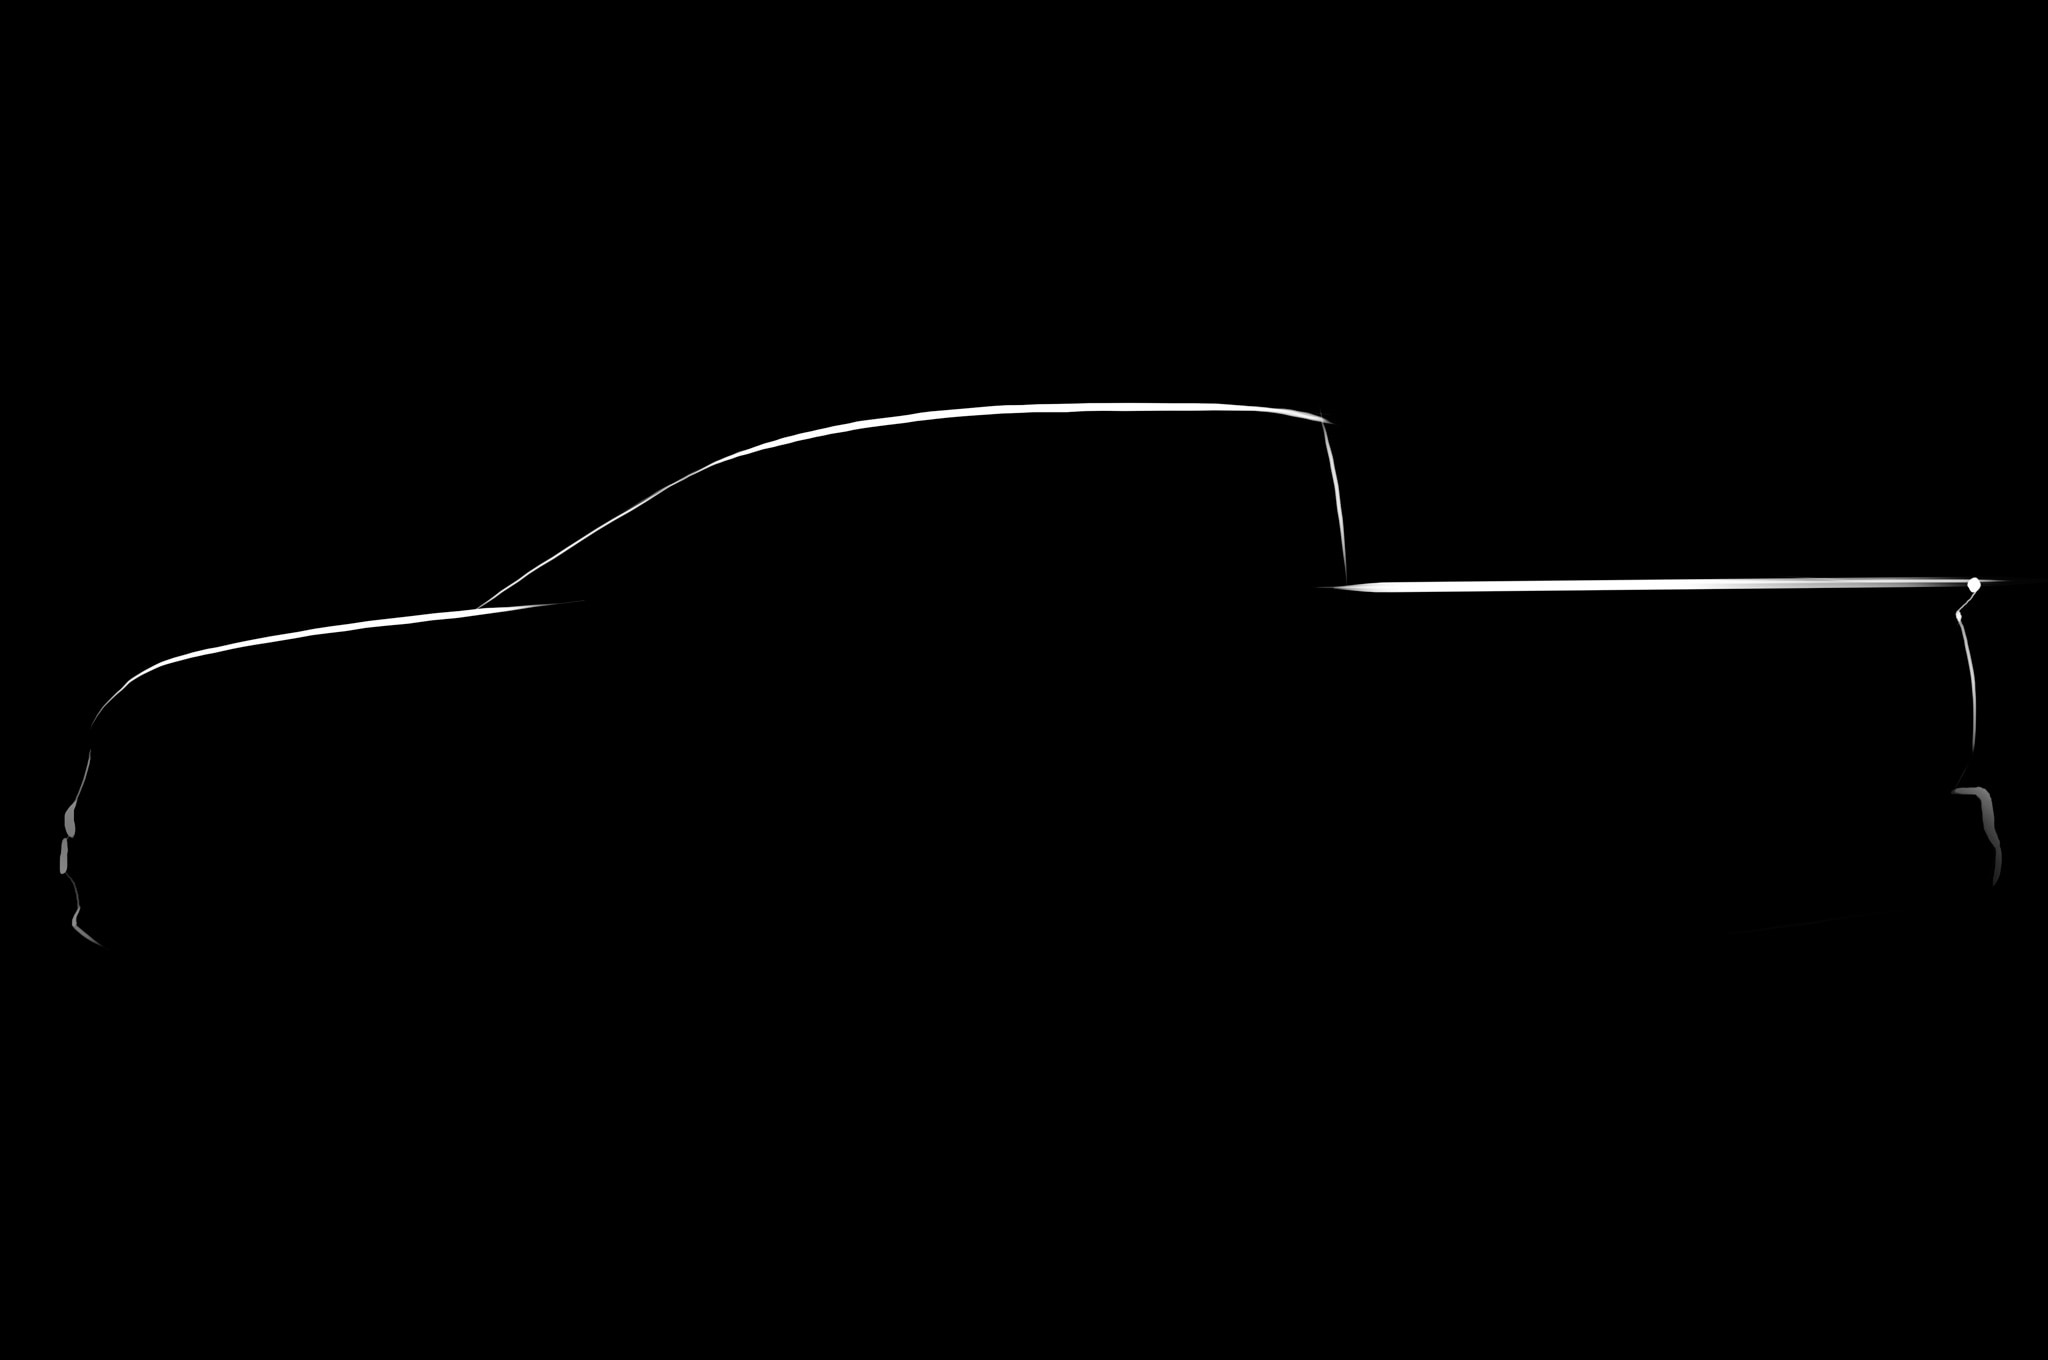 2016 Honda Ridgeline Teaser Sketch1